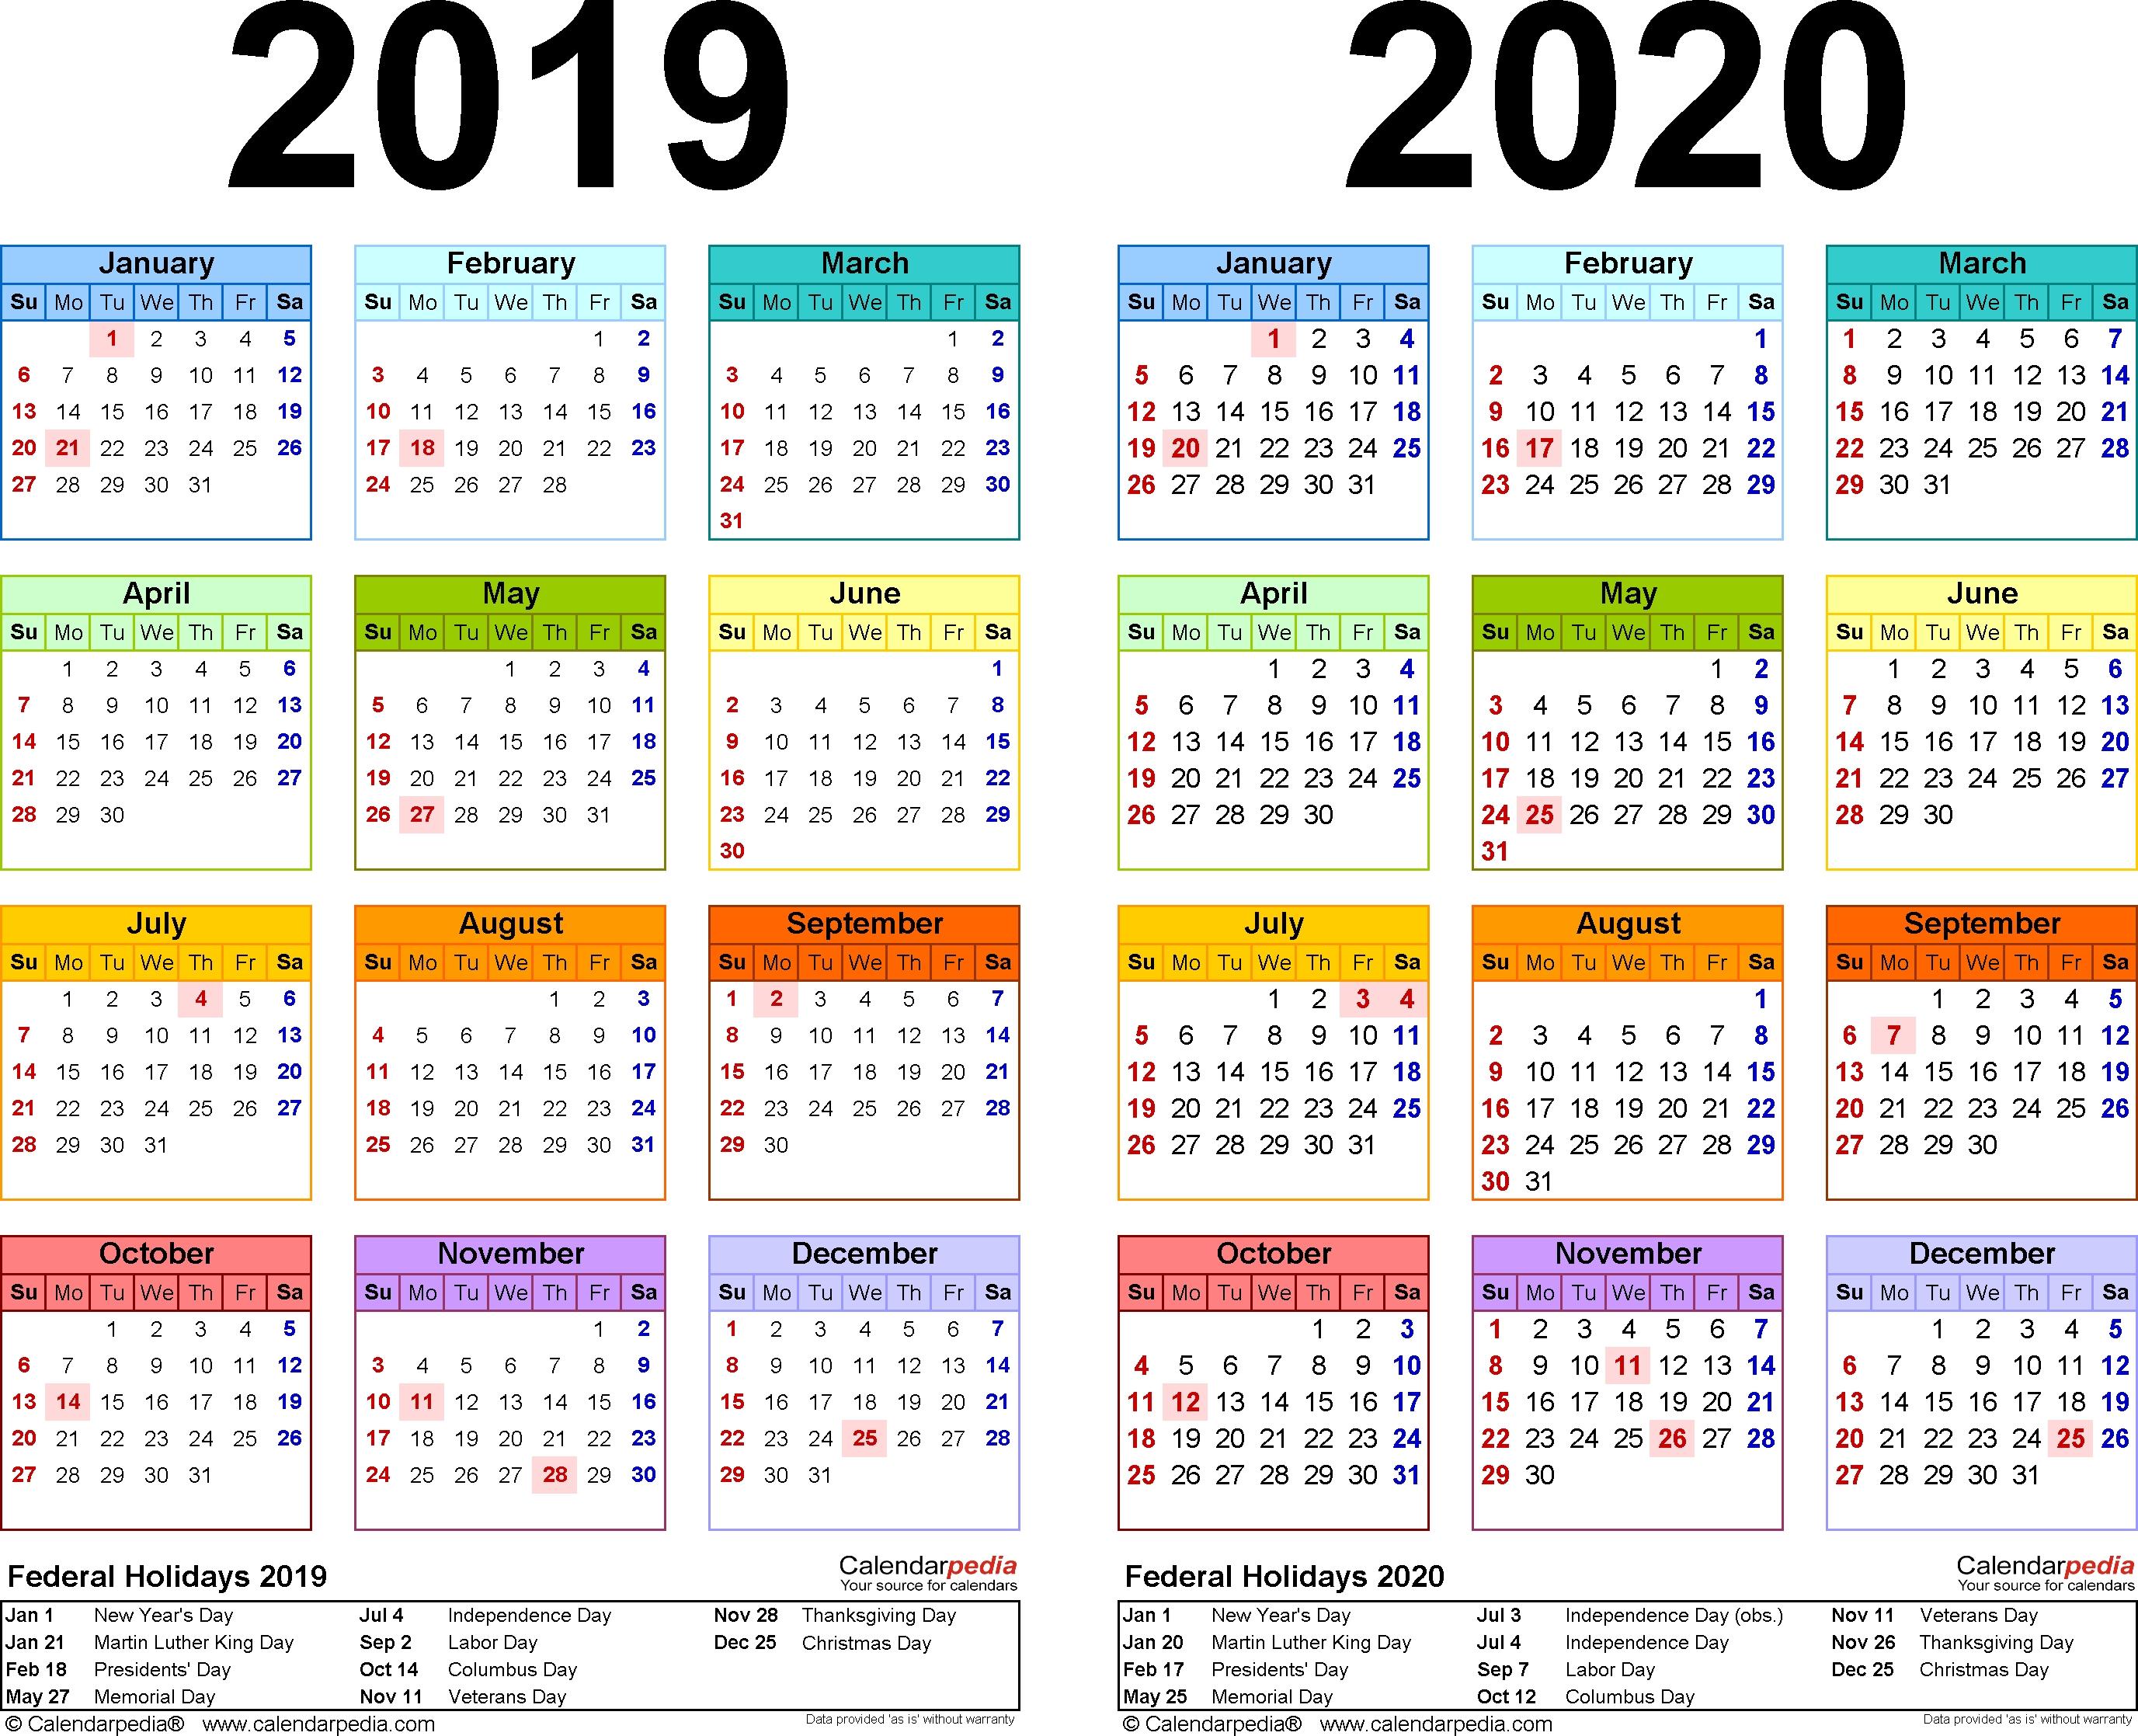 2019-2020 Two Year Calendar - Free Printable Pdf Templates-Blank 3 Month Calendar 2020 Printable